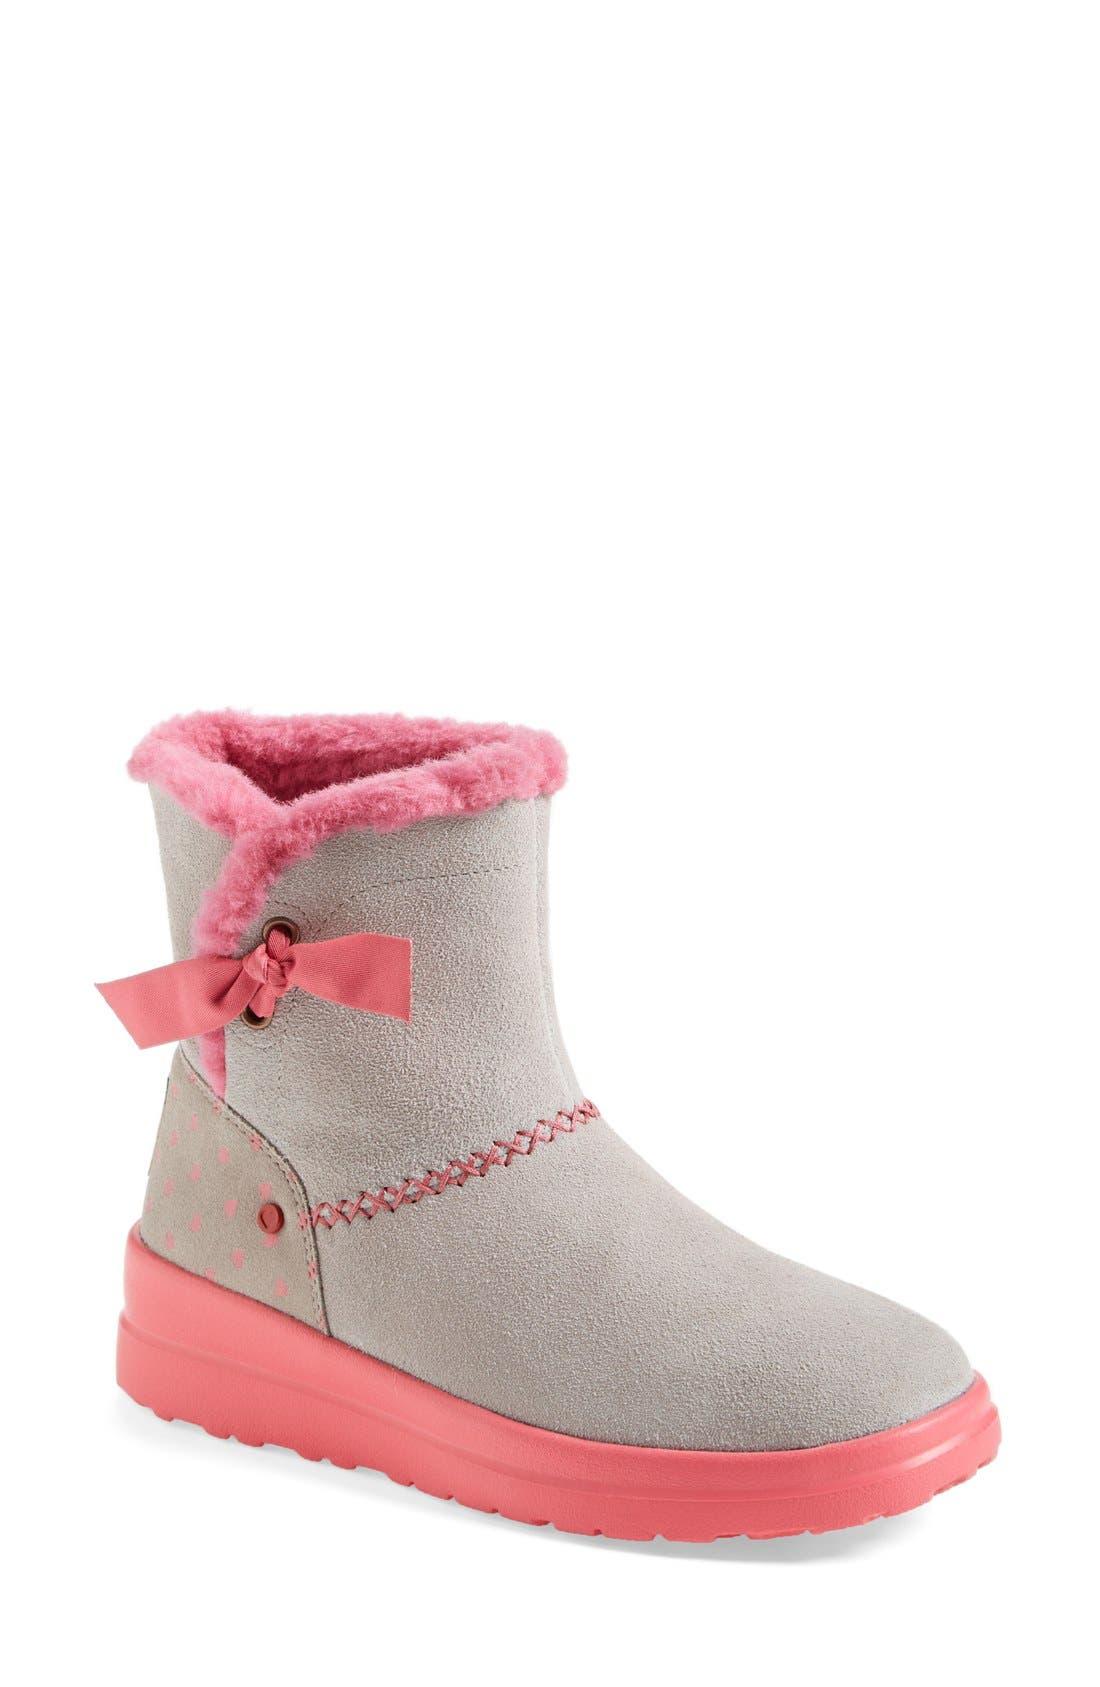 Main Image - I Heart UGG™ by UGG® Australia 'I Heart Knotty' Boot